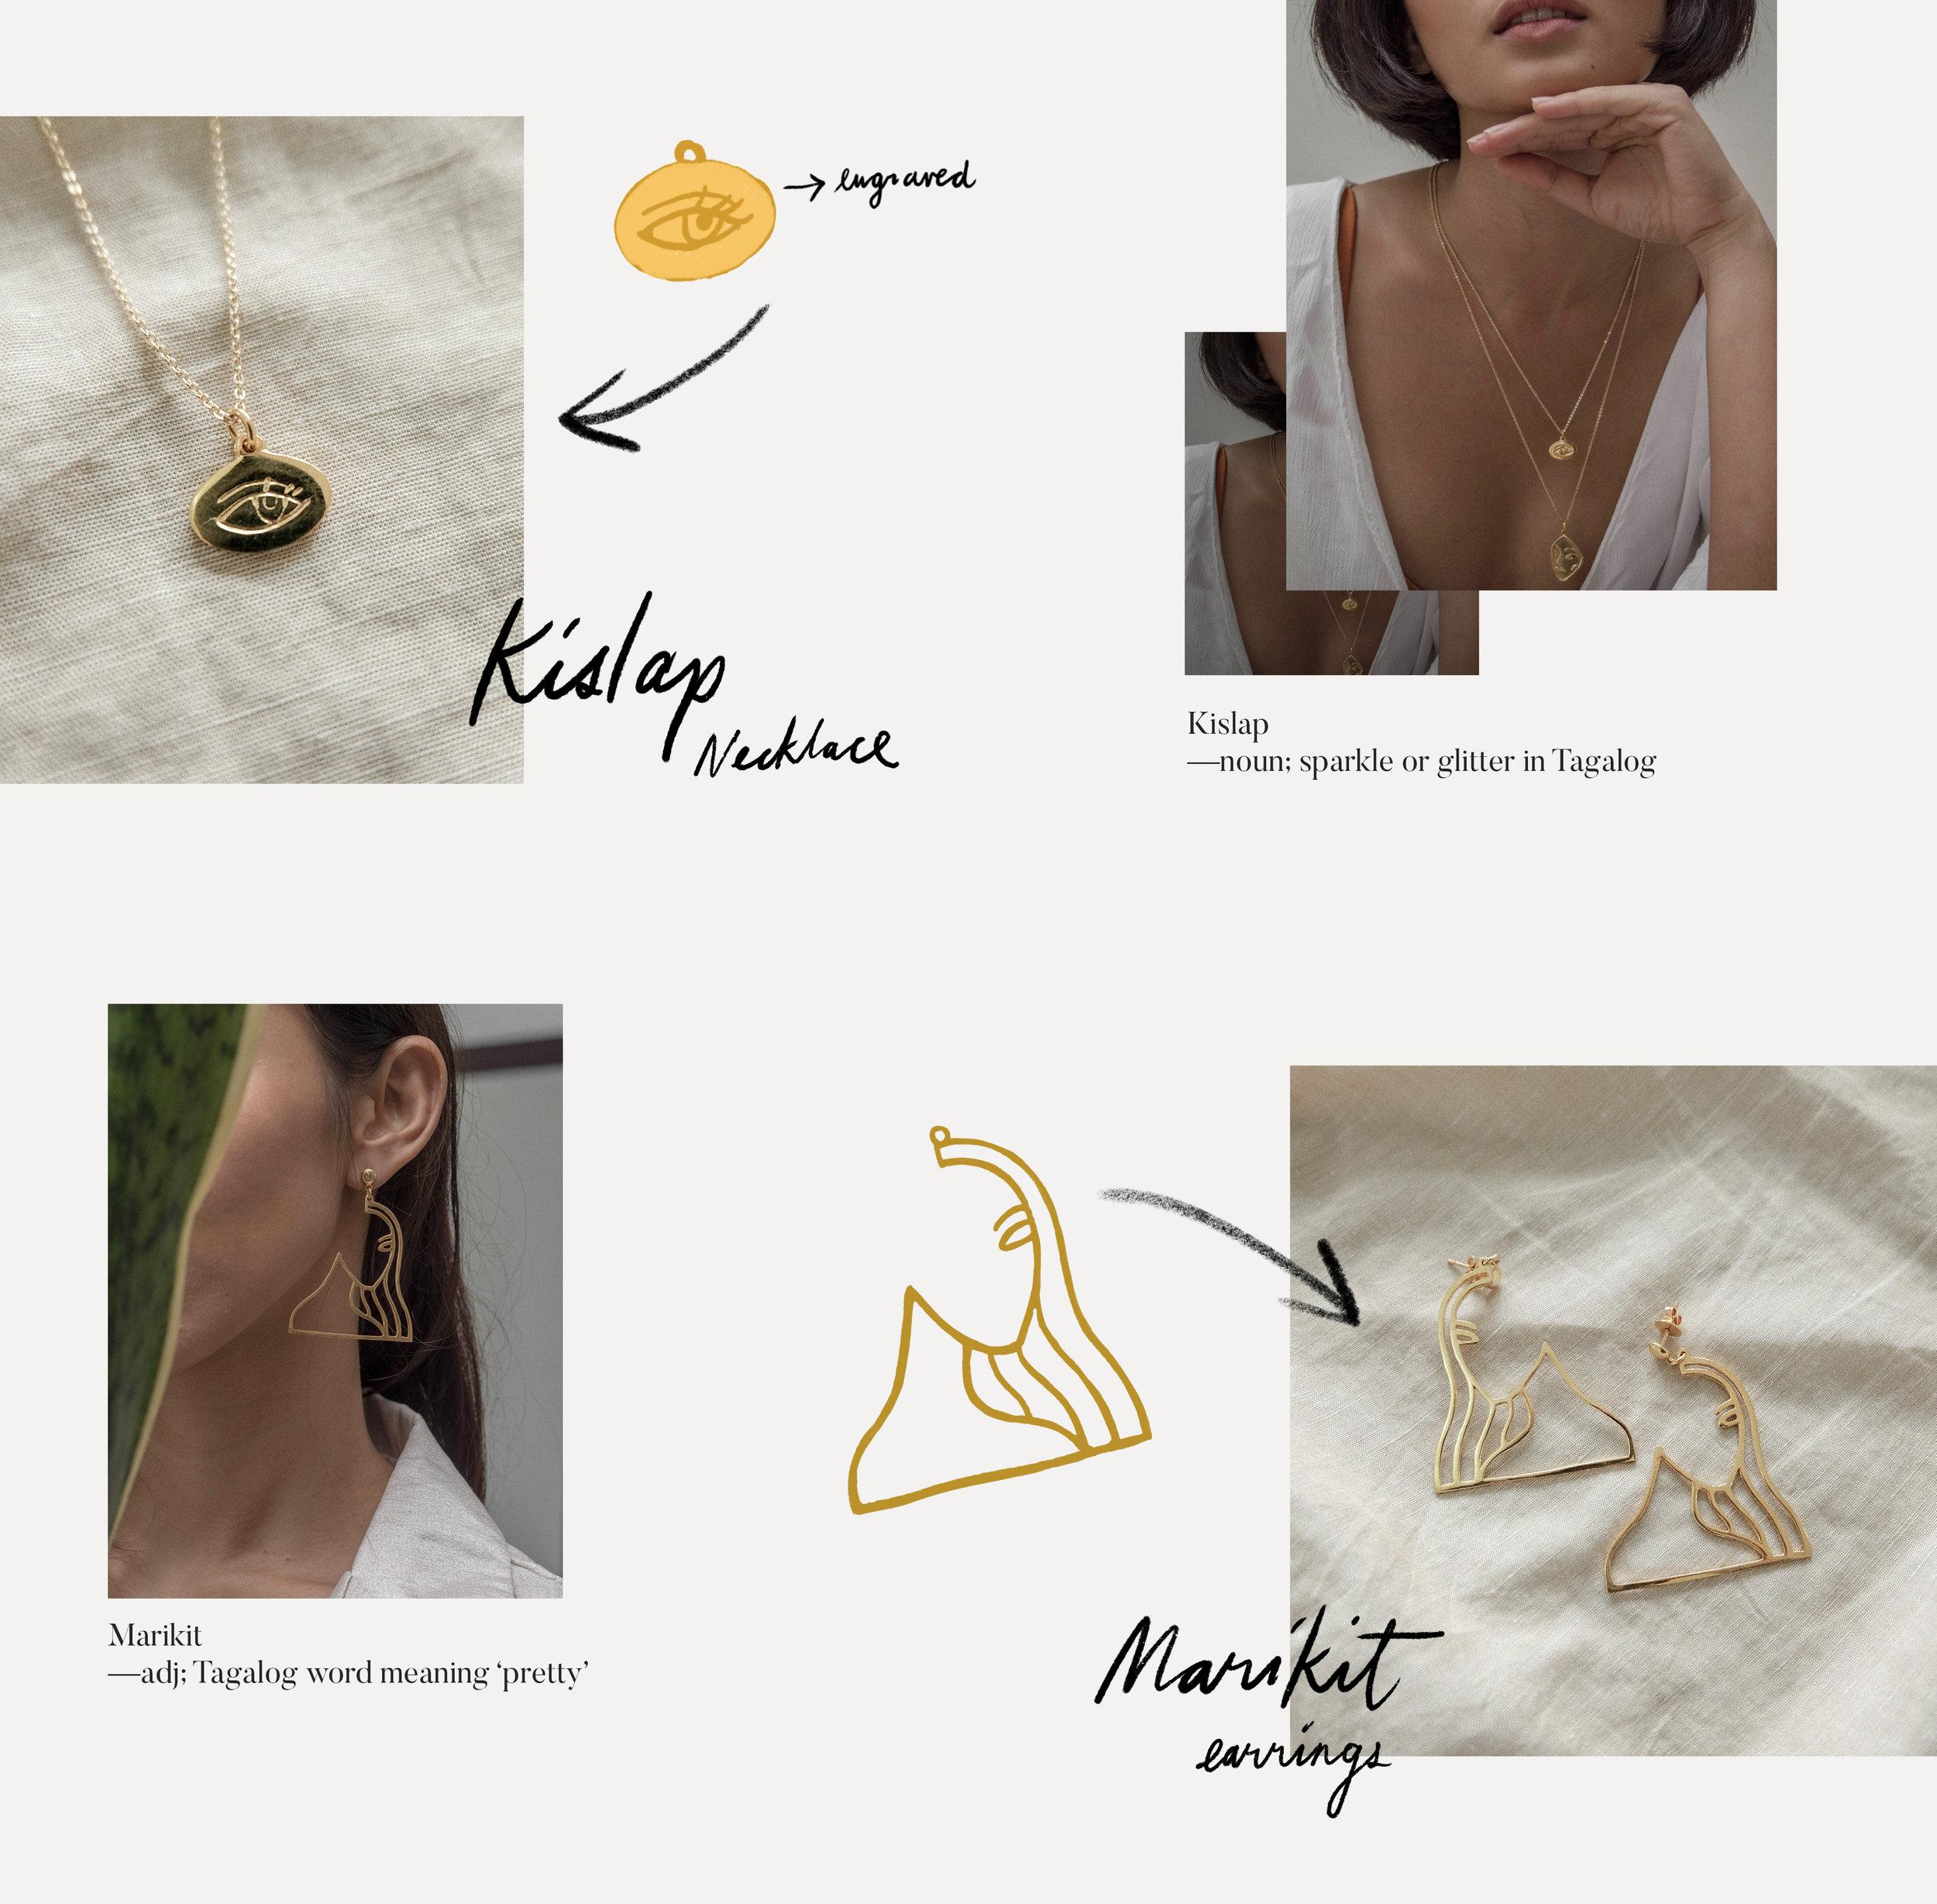 jewelry-01a.jpg